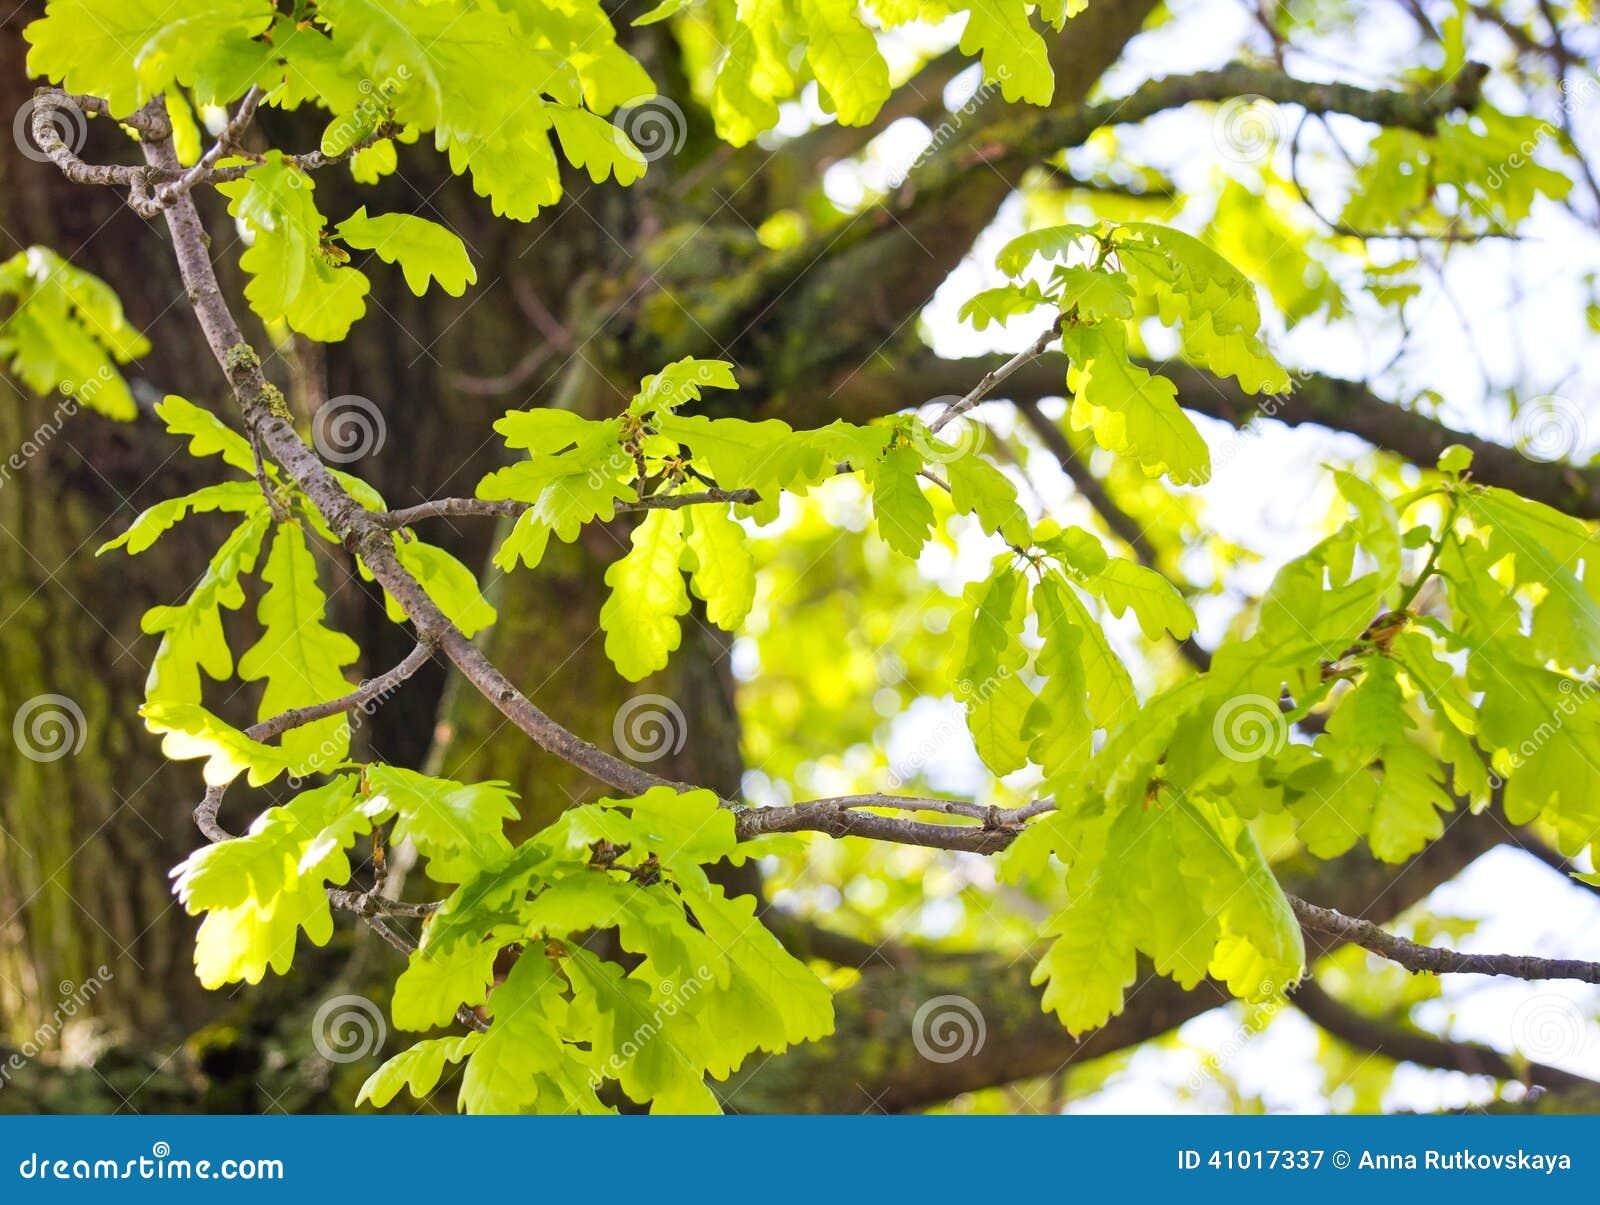 Enchanting Tree Coloring Vignette - Coloring Page - senderolasbrumas ...